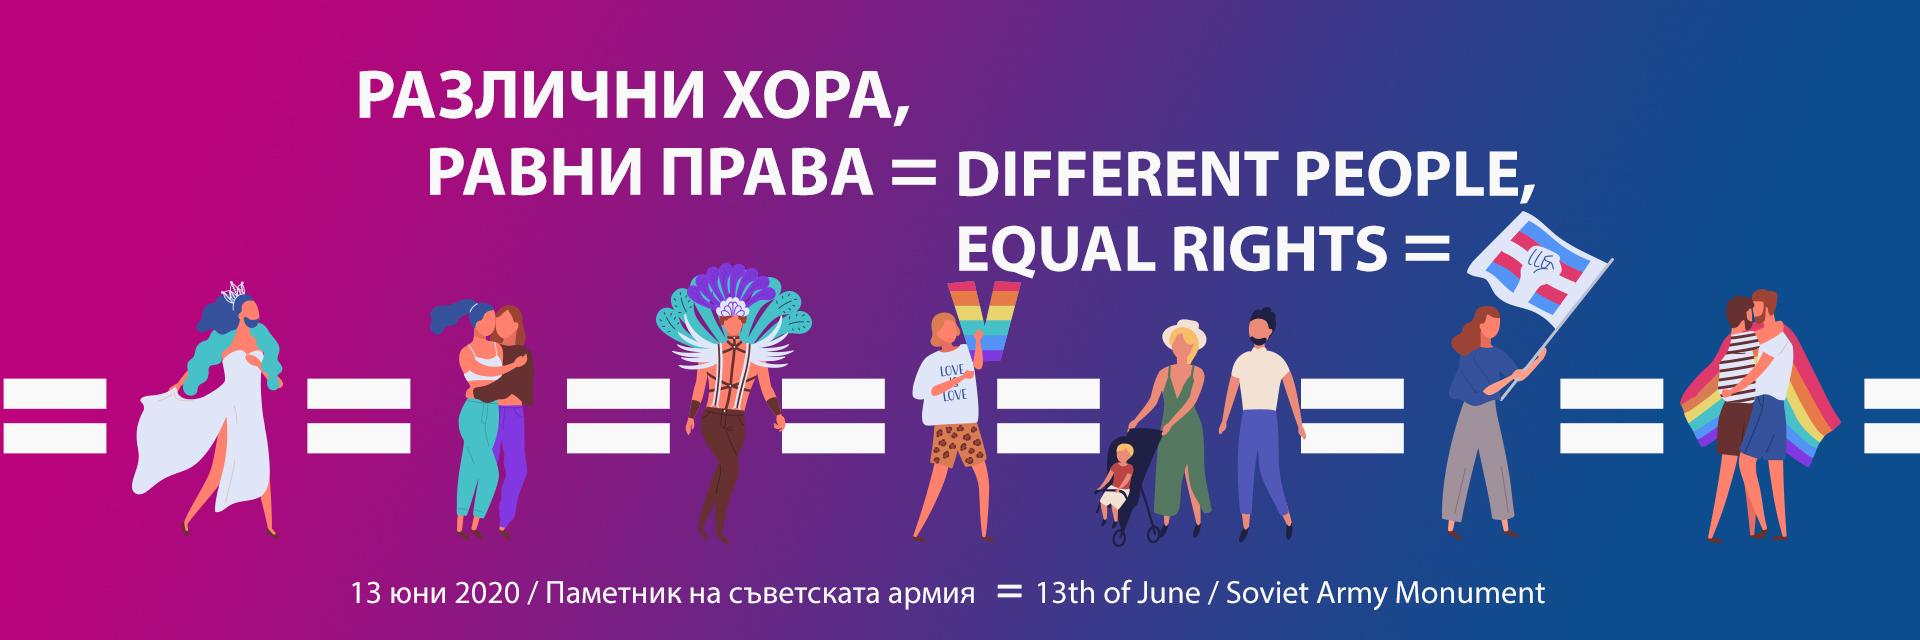 Sofia Pride will be on 13 June 2020